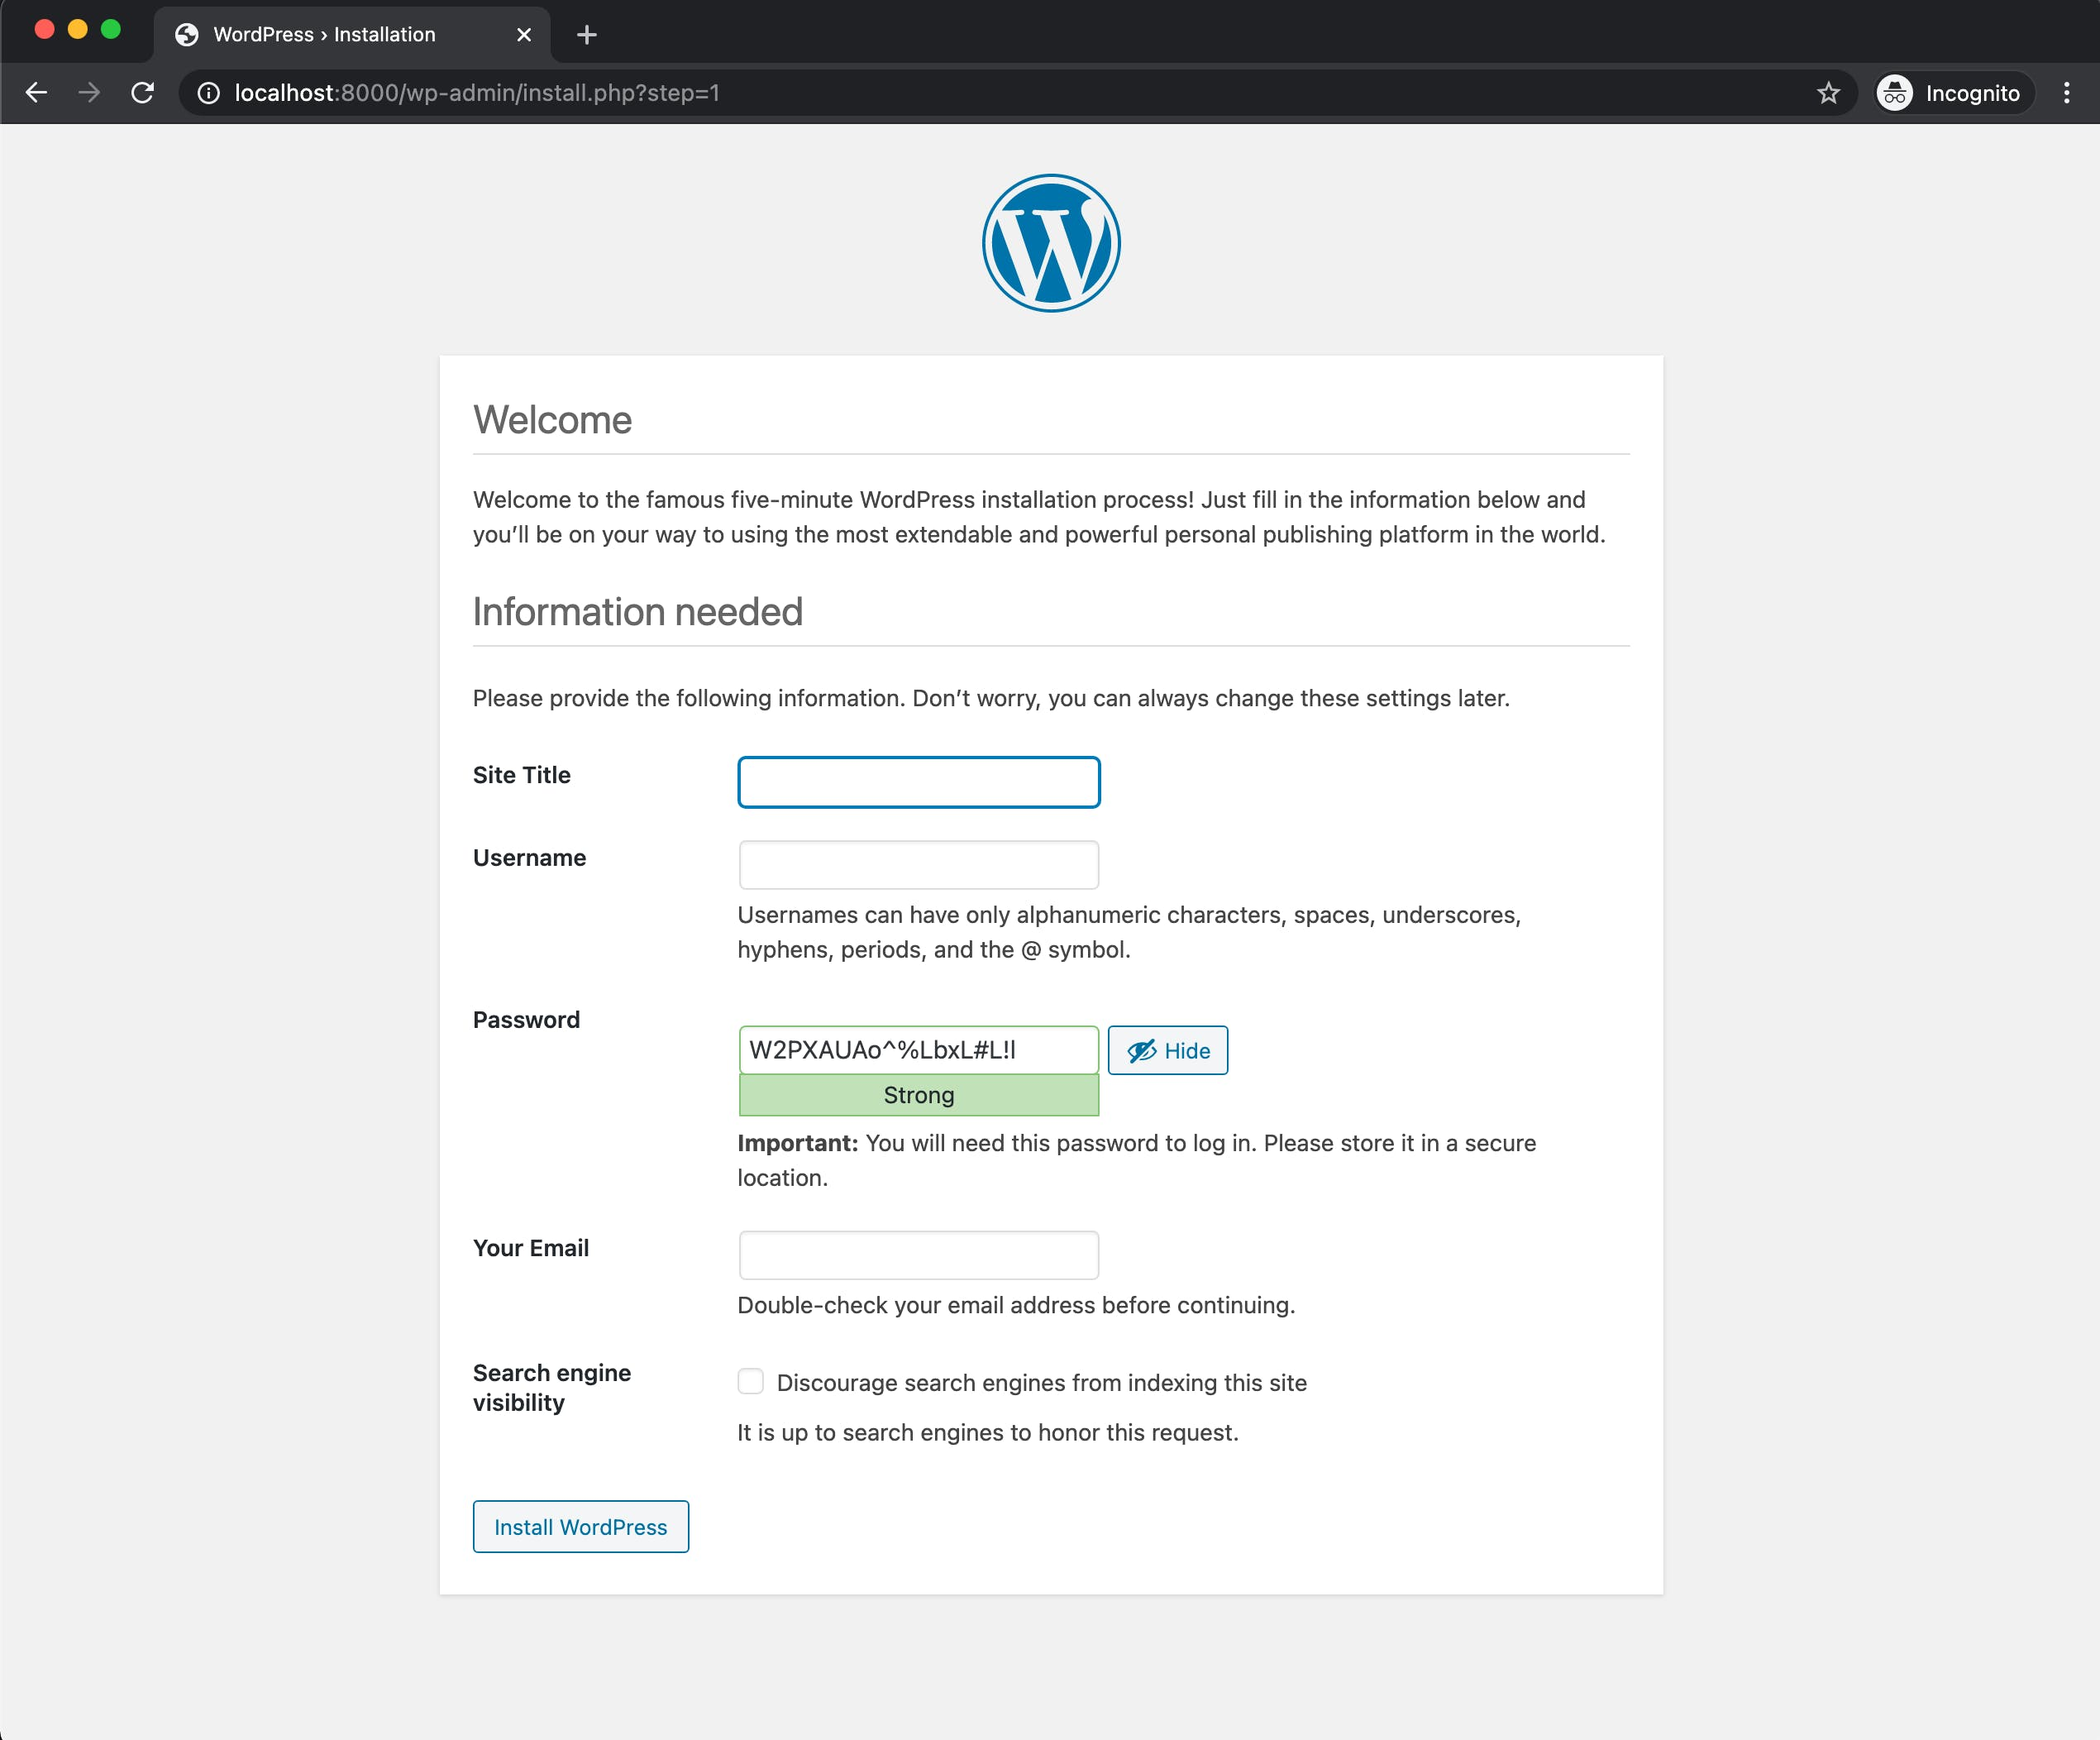 wordpress-step2.png